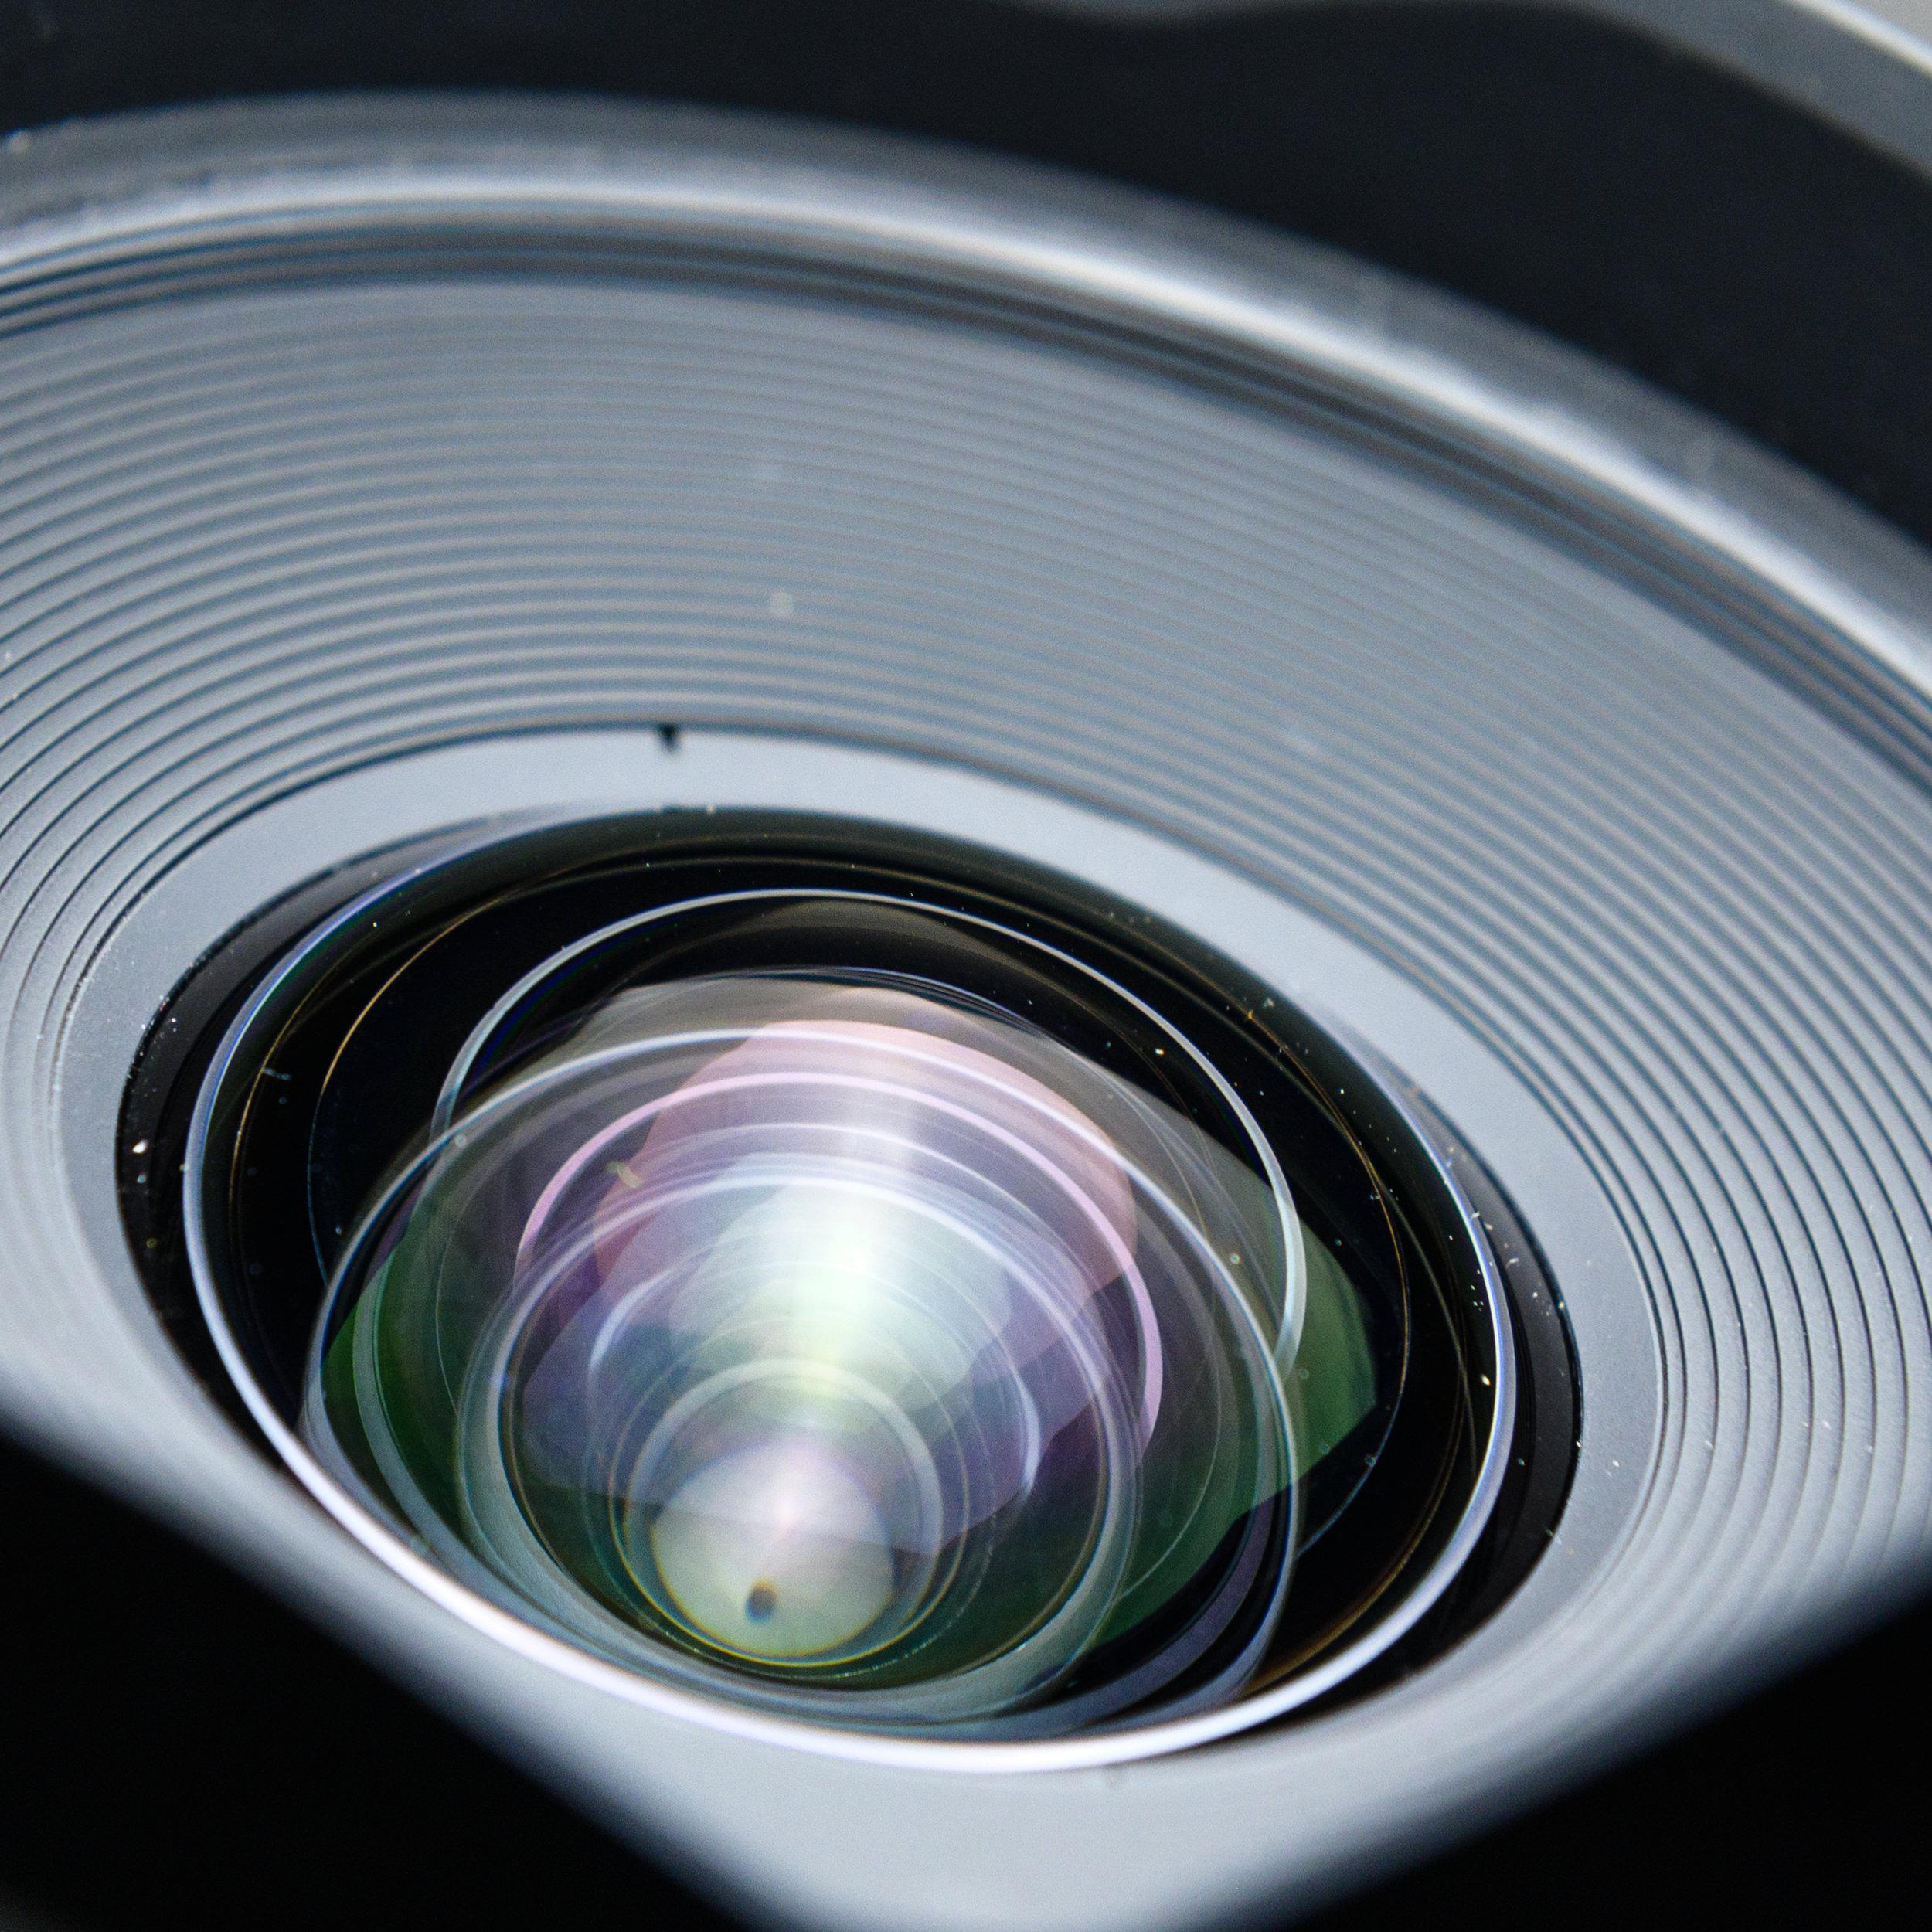 IRIX 15mm f/2.4 Firefly Ultra Wide Angle Lens for Nikon F Mount